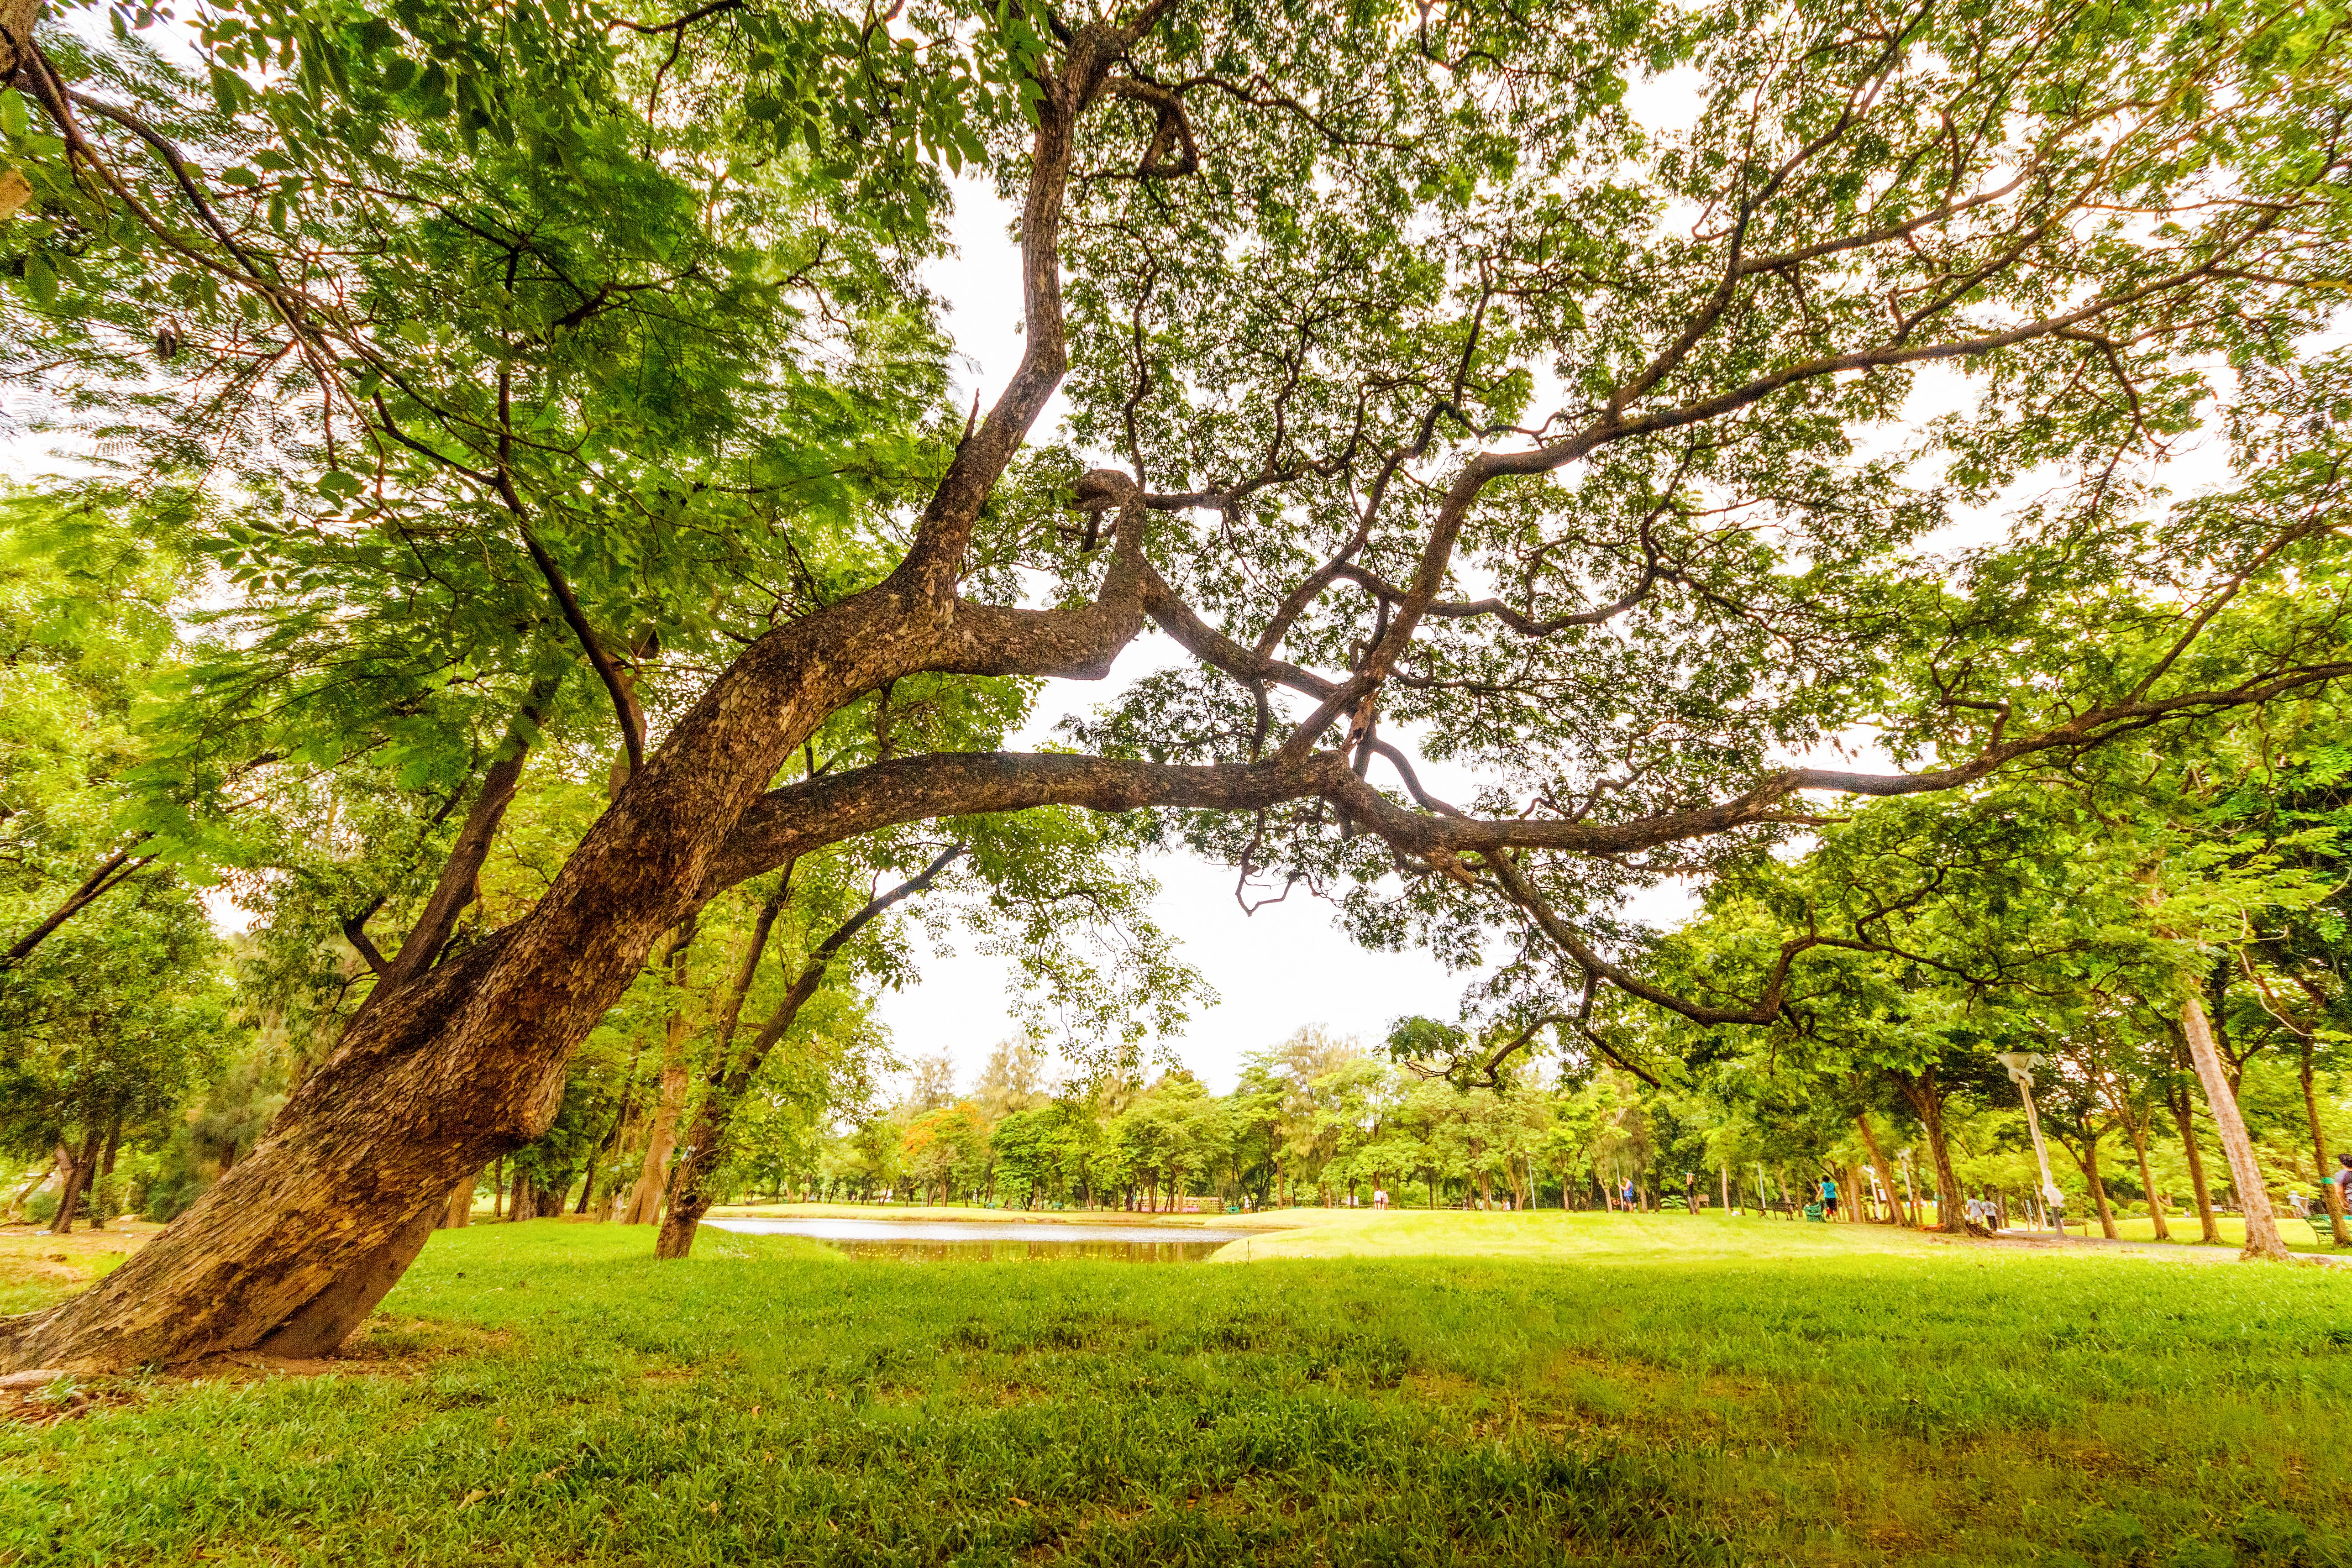 tree overlooking lake in grassy field